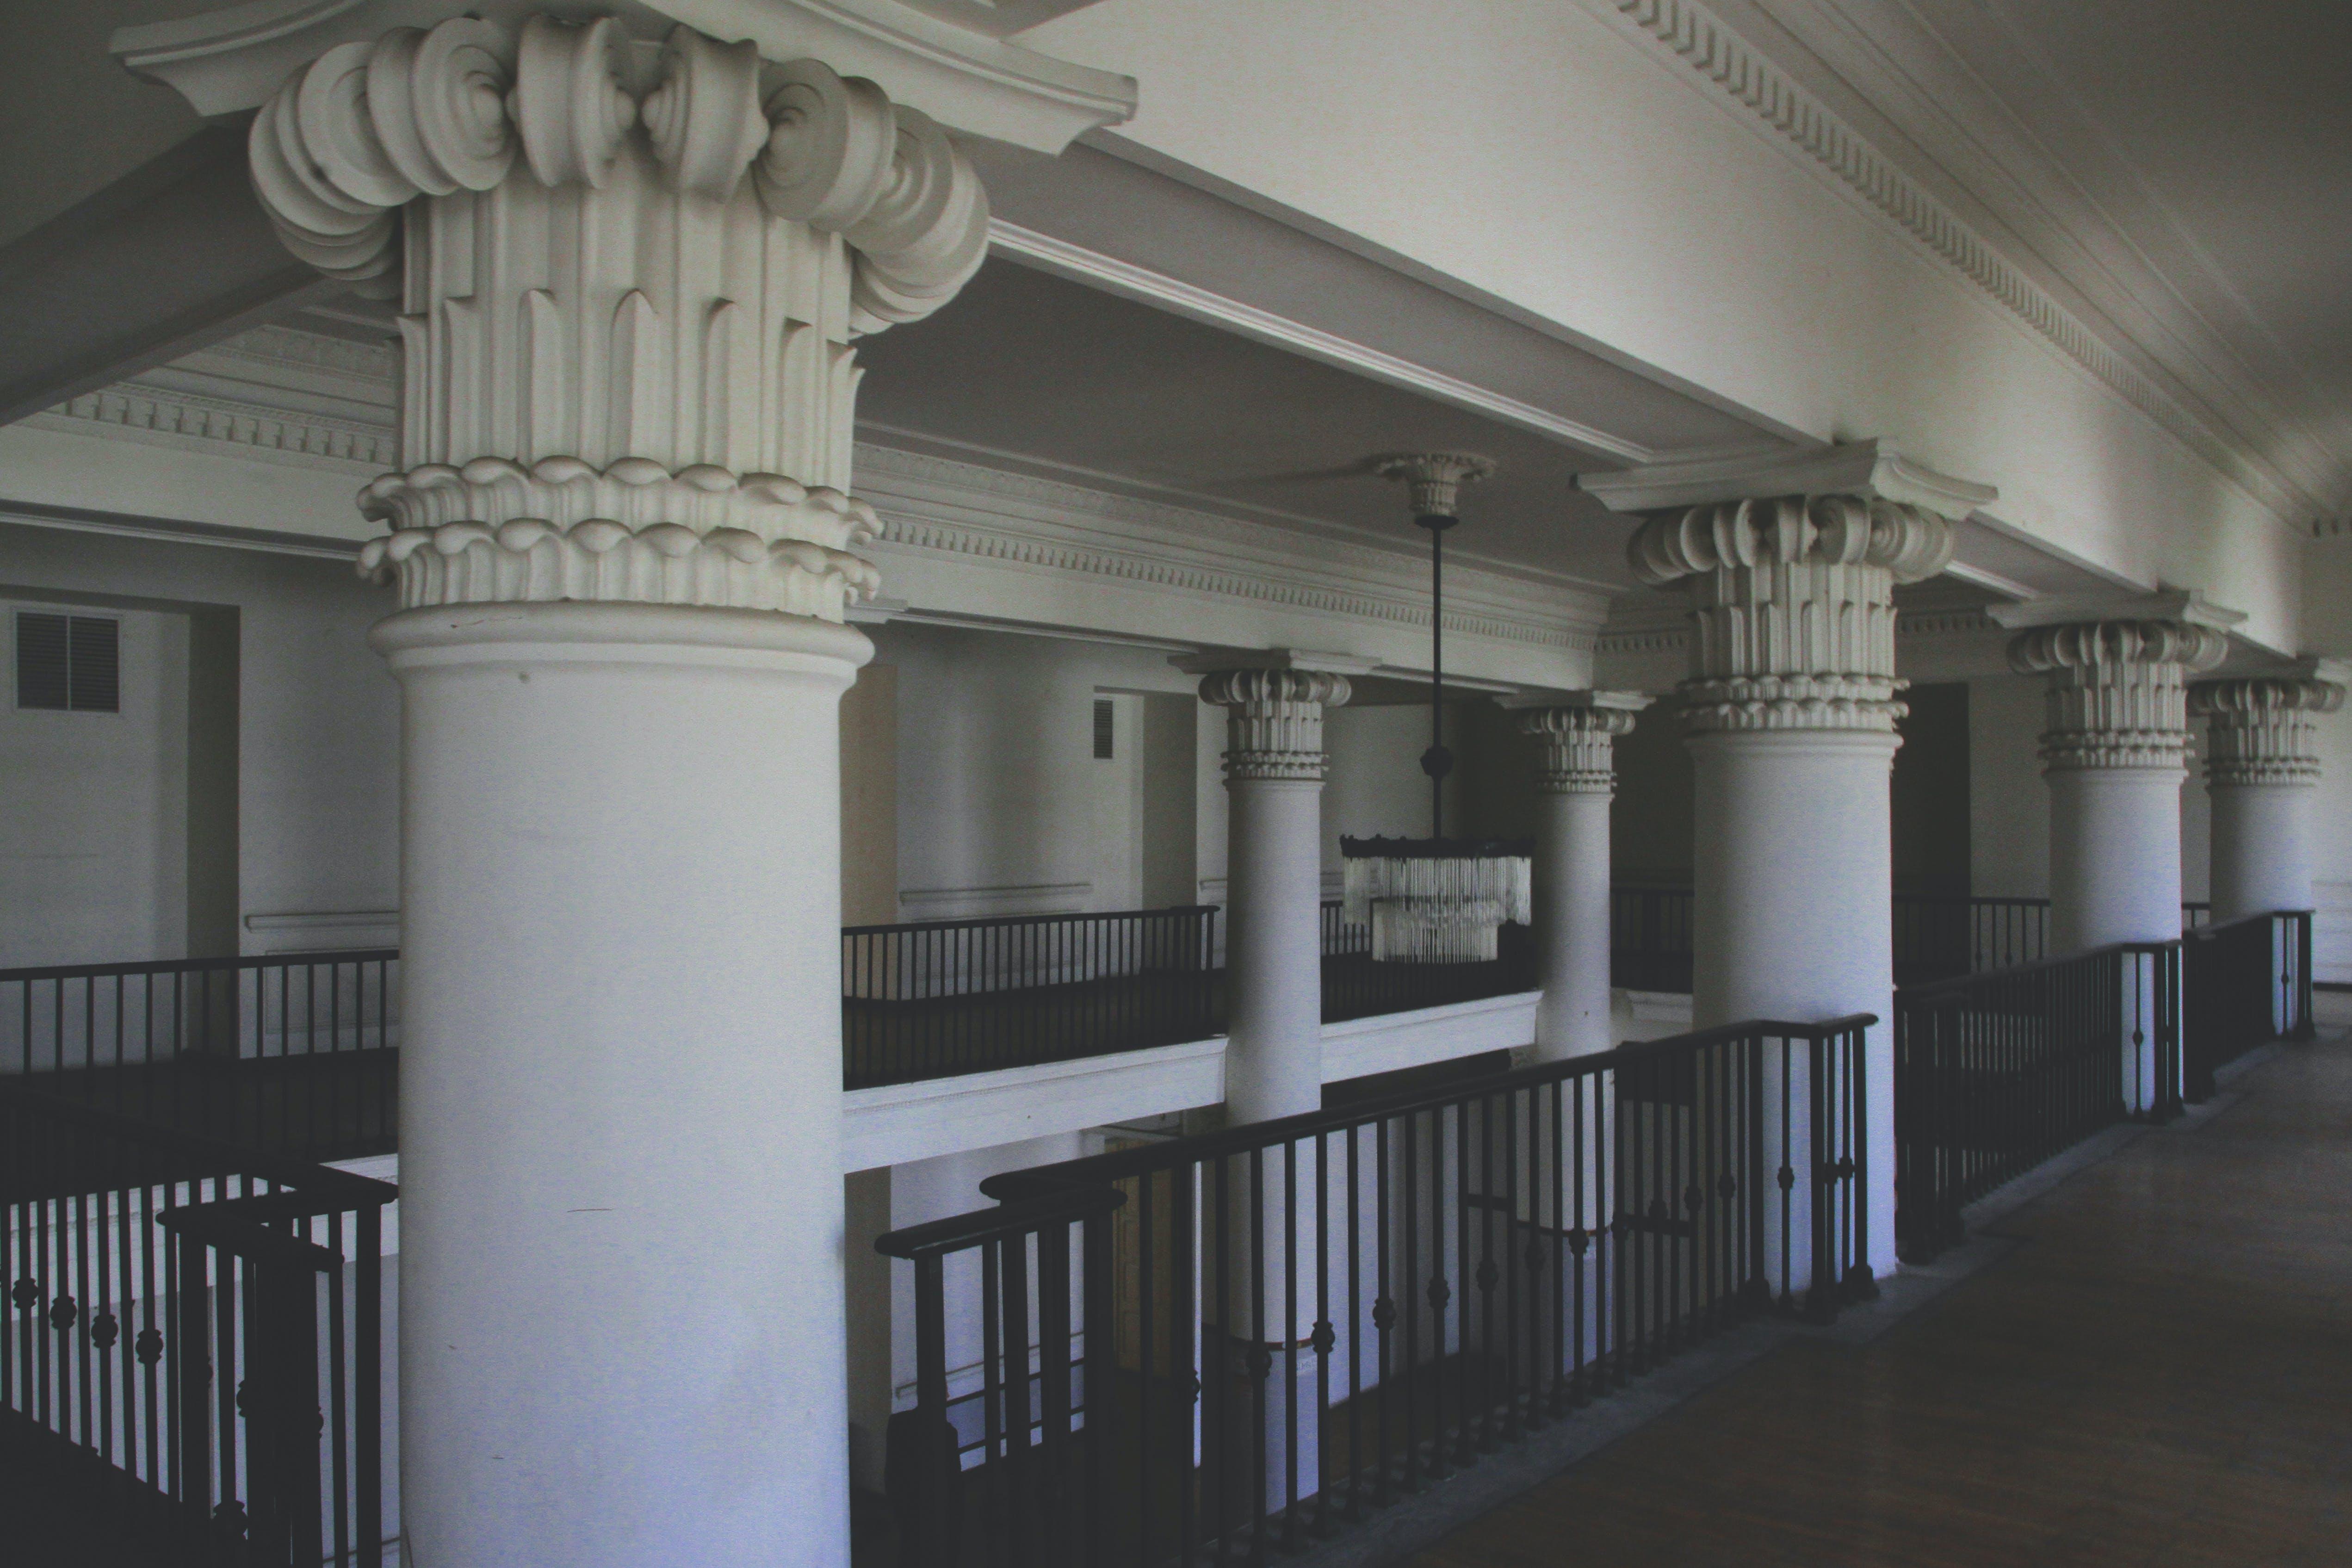 Photo of White Columns Near Railings